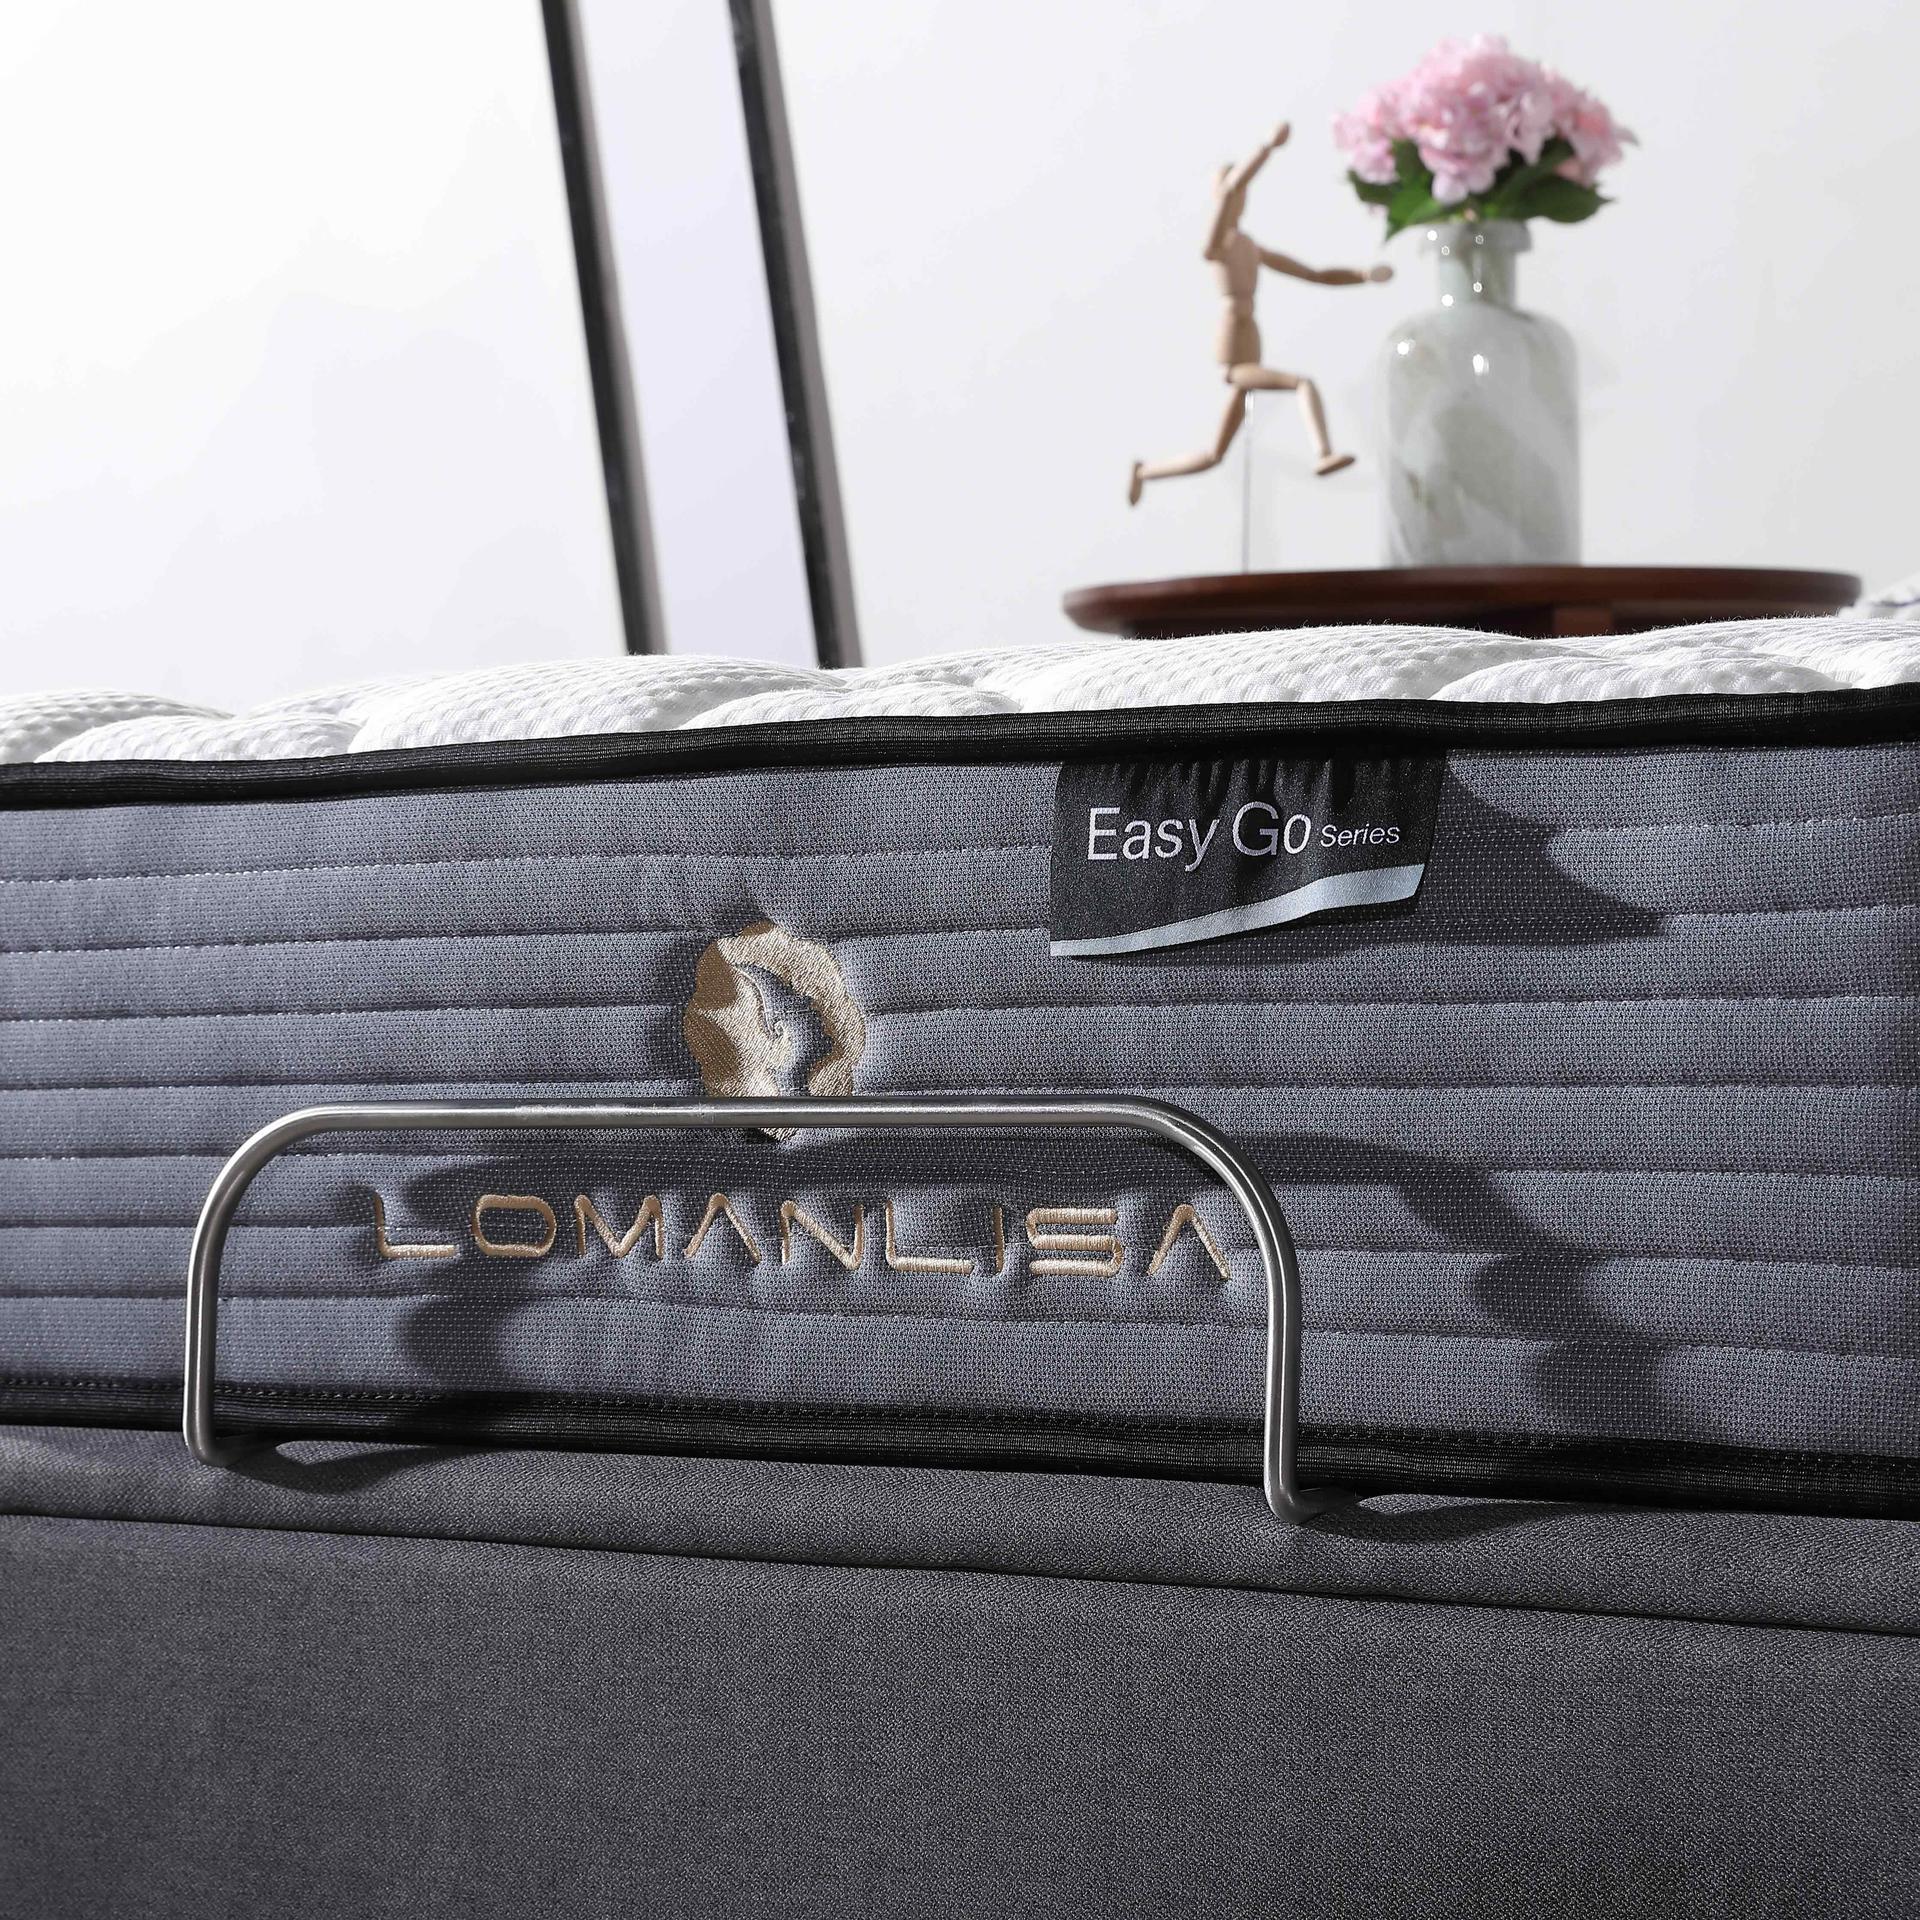 Best Selling Electric Comfortable Adjustable Bed With Quiet Stable Motor Floor Mattress